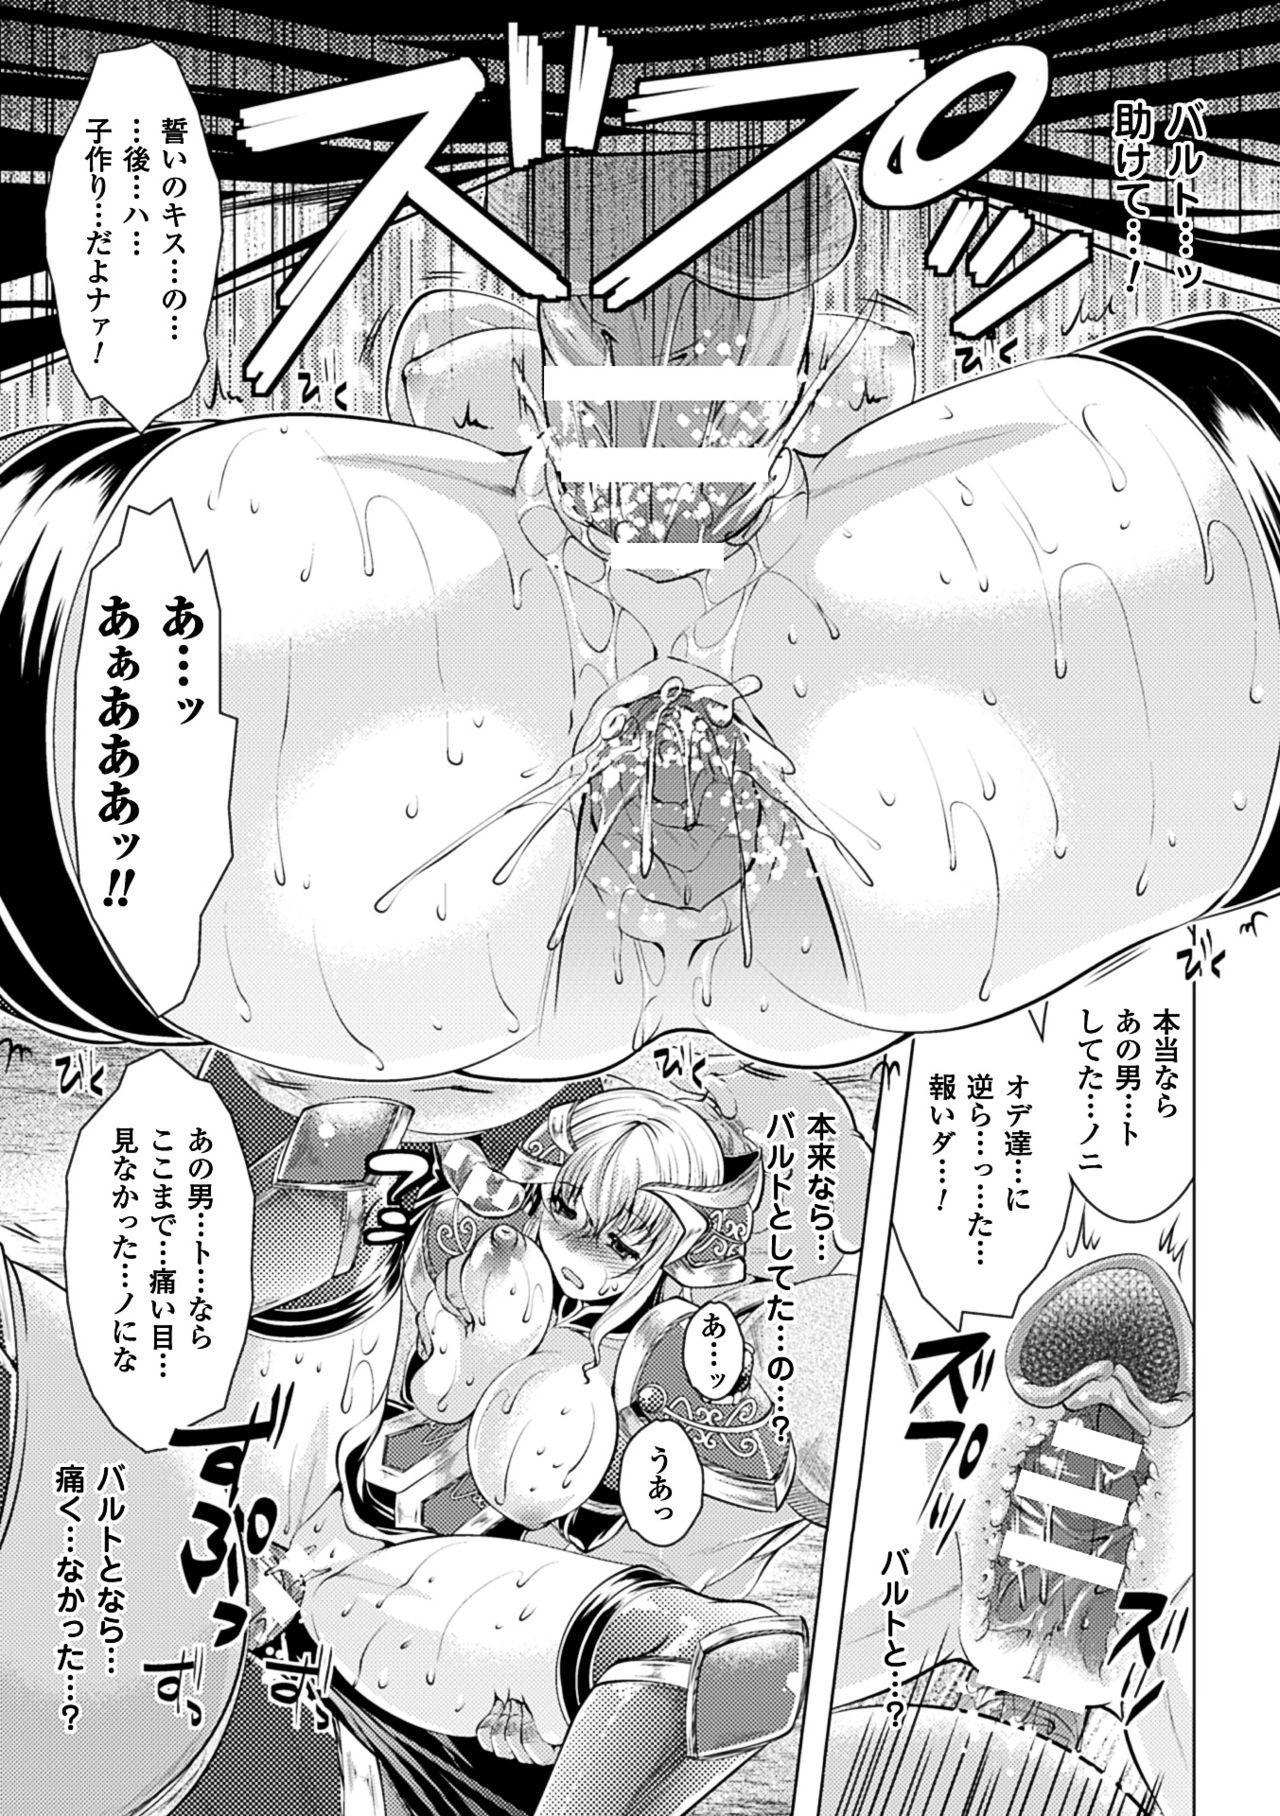 2D Comic Magazine Orc no Tame no Onna Kishi Taisaku Manual Vol. 1 20